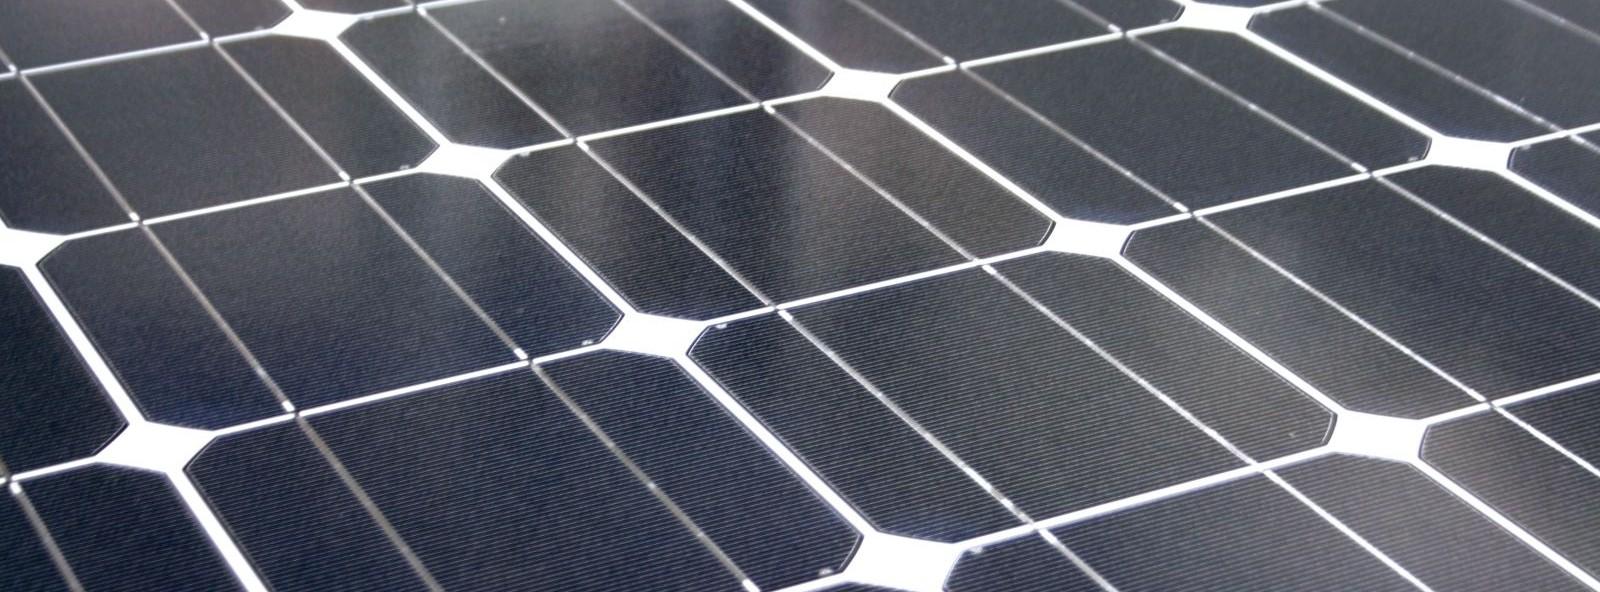 PV-solar-panel